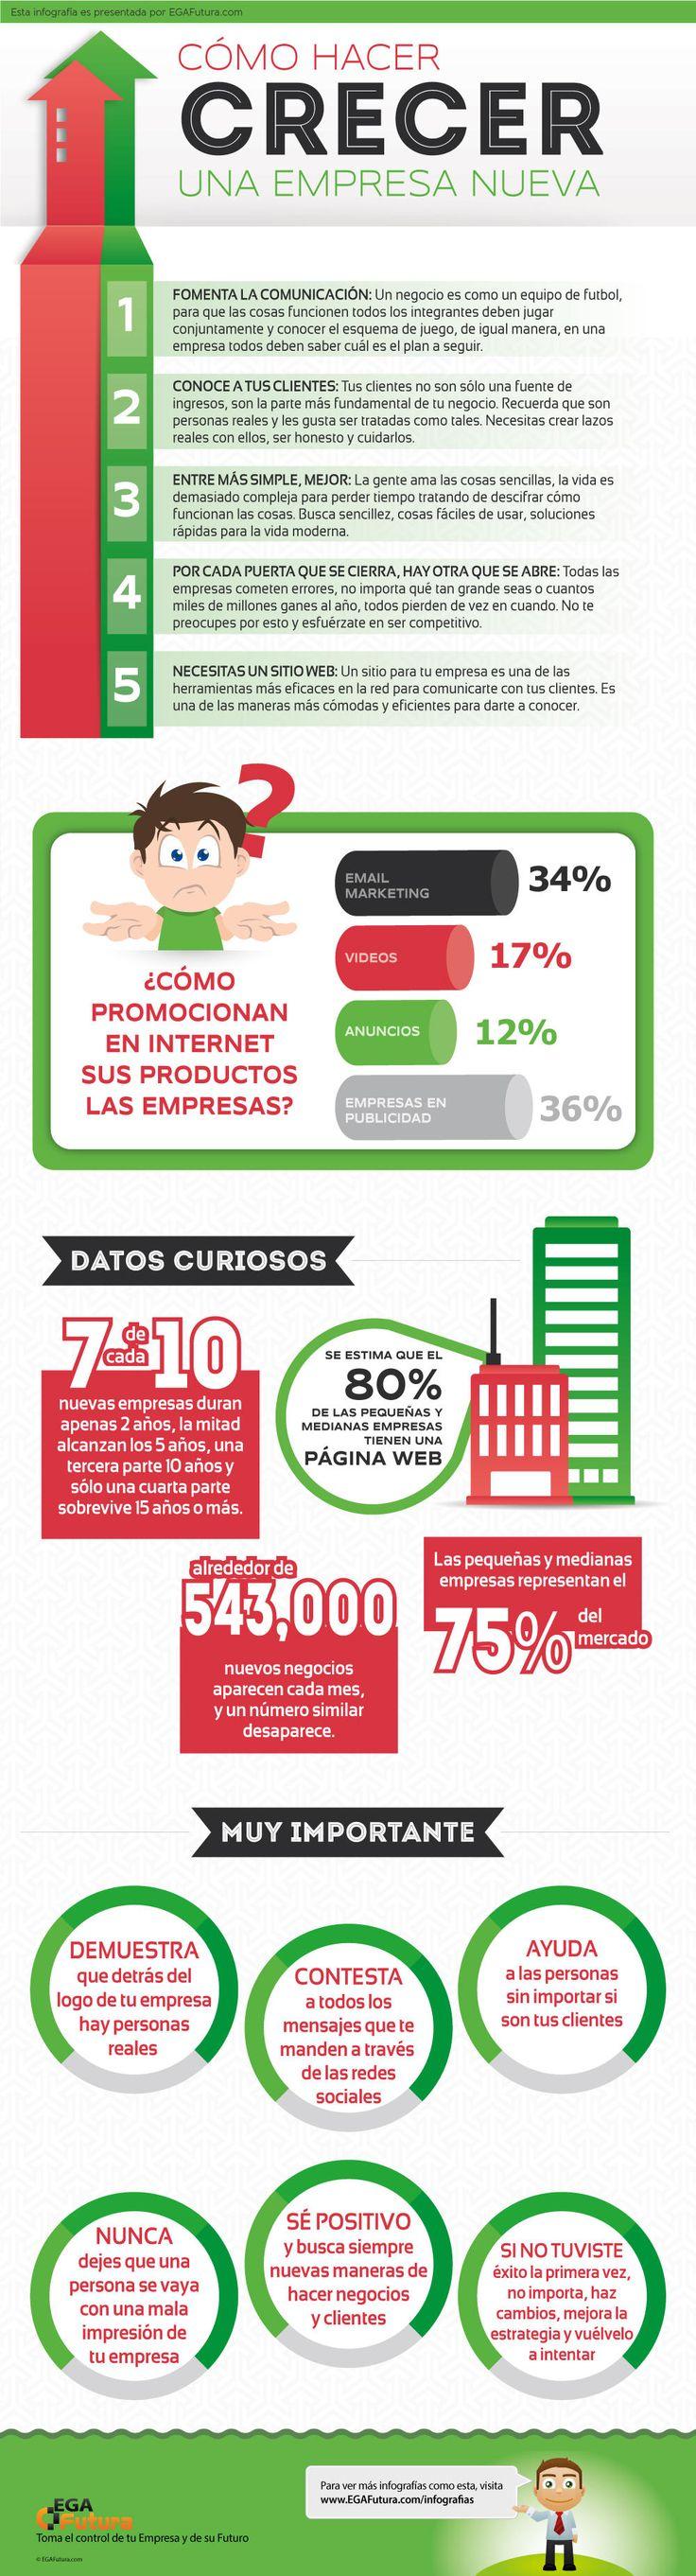 Cómo hacer crecer una empresa nueva #infografia #infographic #entrepreneurship #MUN2emprende